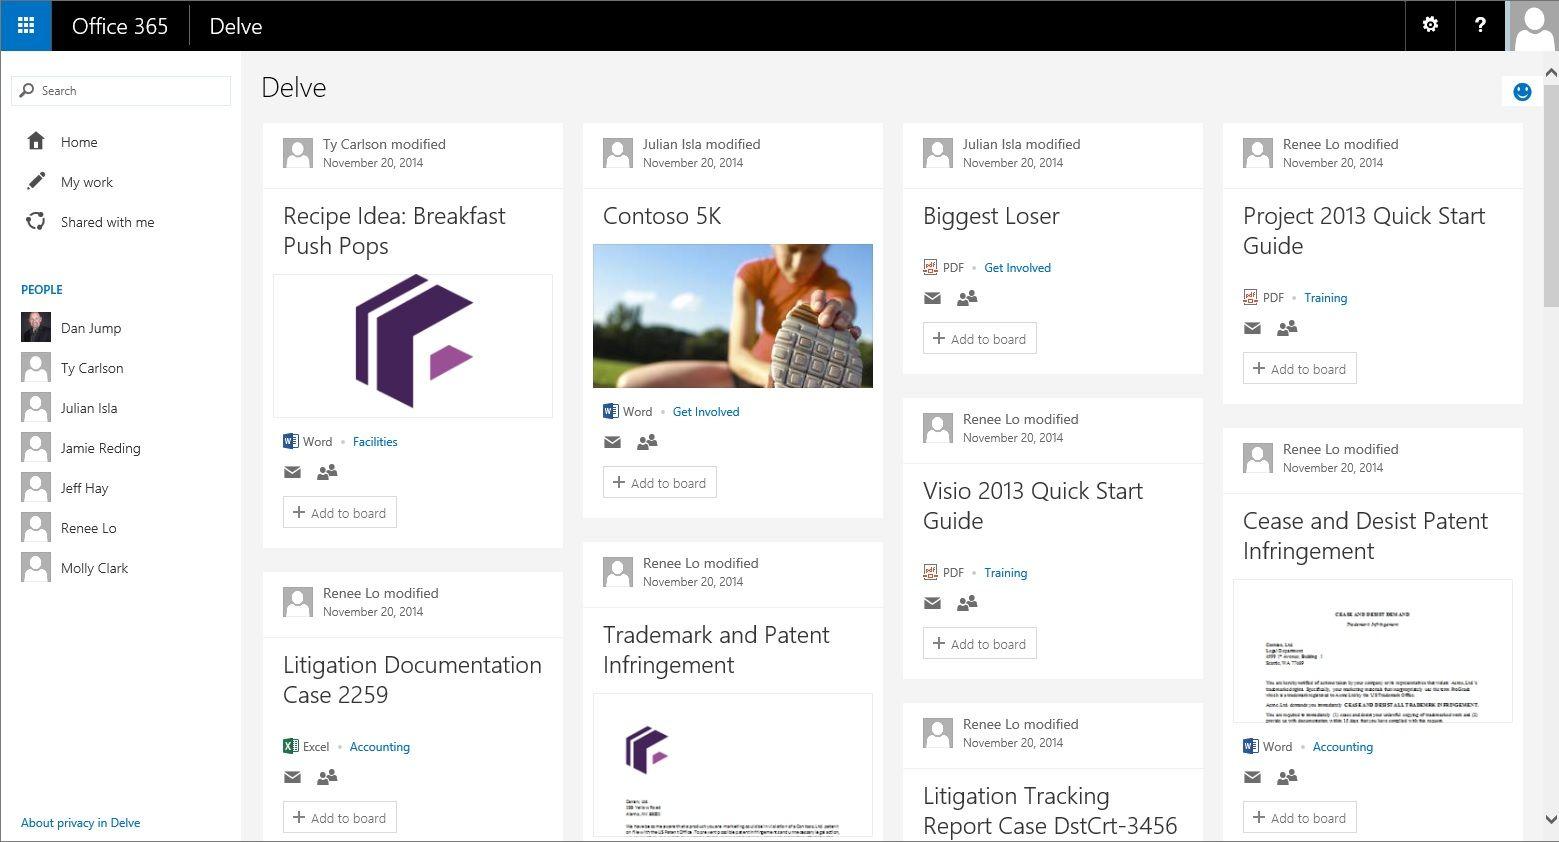 MicrosoftOfficeDelveOffice365 Microsoft office